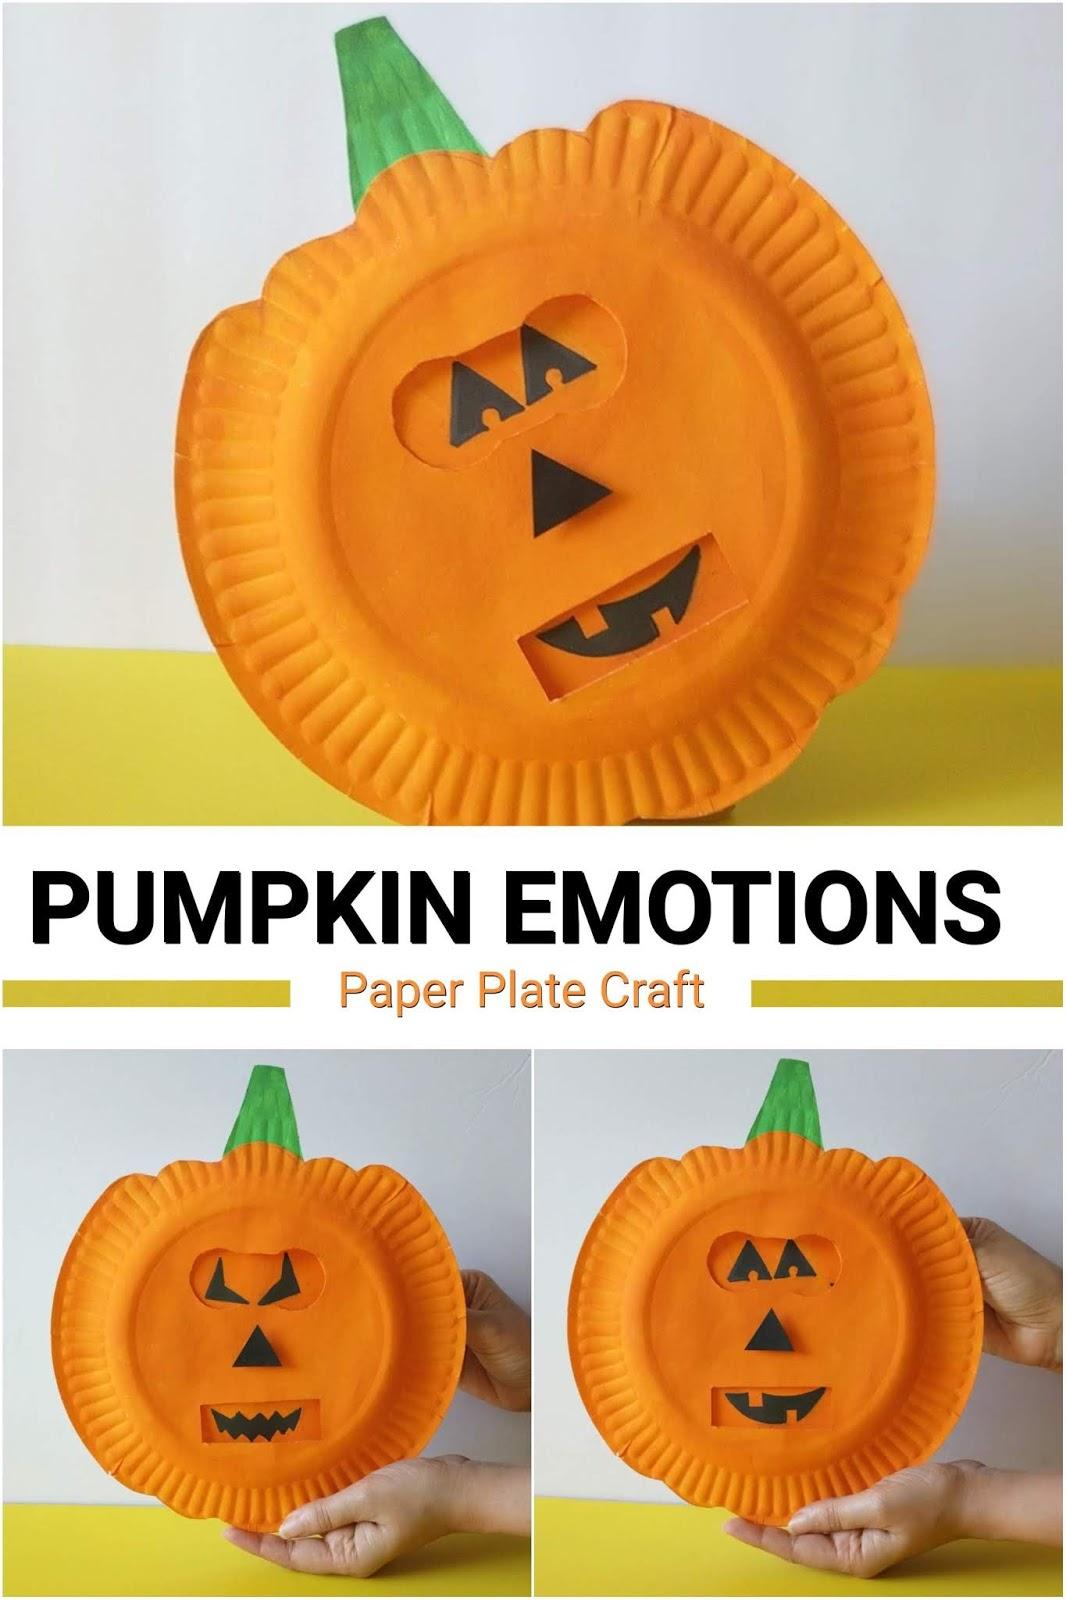 Simple halloween crafts, Halloween pumpkin, emotions crafts, pumpkin crafts and activities, pumpkin ideas for kids, paper craft, paper plate crafts, jack-o-lantern crafts, halloween crafts for kids, halloween decor, halloween ideas for children, children halloween crafts, halloween fun for kids, halloween project, halloween arts and crafts, fall crafts, fall arts, Kids craft, crafts for kids, craft ideas, kids crafts, craft ideas for kids, paper craft, art projects for kids, easy crafts for kids, fun craft for kids, kids arts and crafts, kids projects, art and crafts ideas, toddler crafts, toddler fun, preschool craft ideas, kindergarten crafts, crafts for young kids, school crafts, interactive crafts, cute crafts for kids, creative crafts, creative art, creative projects for kids.